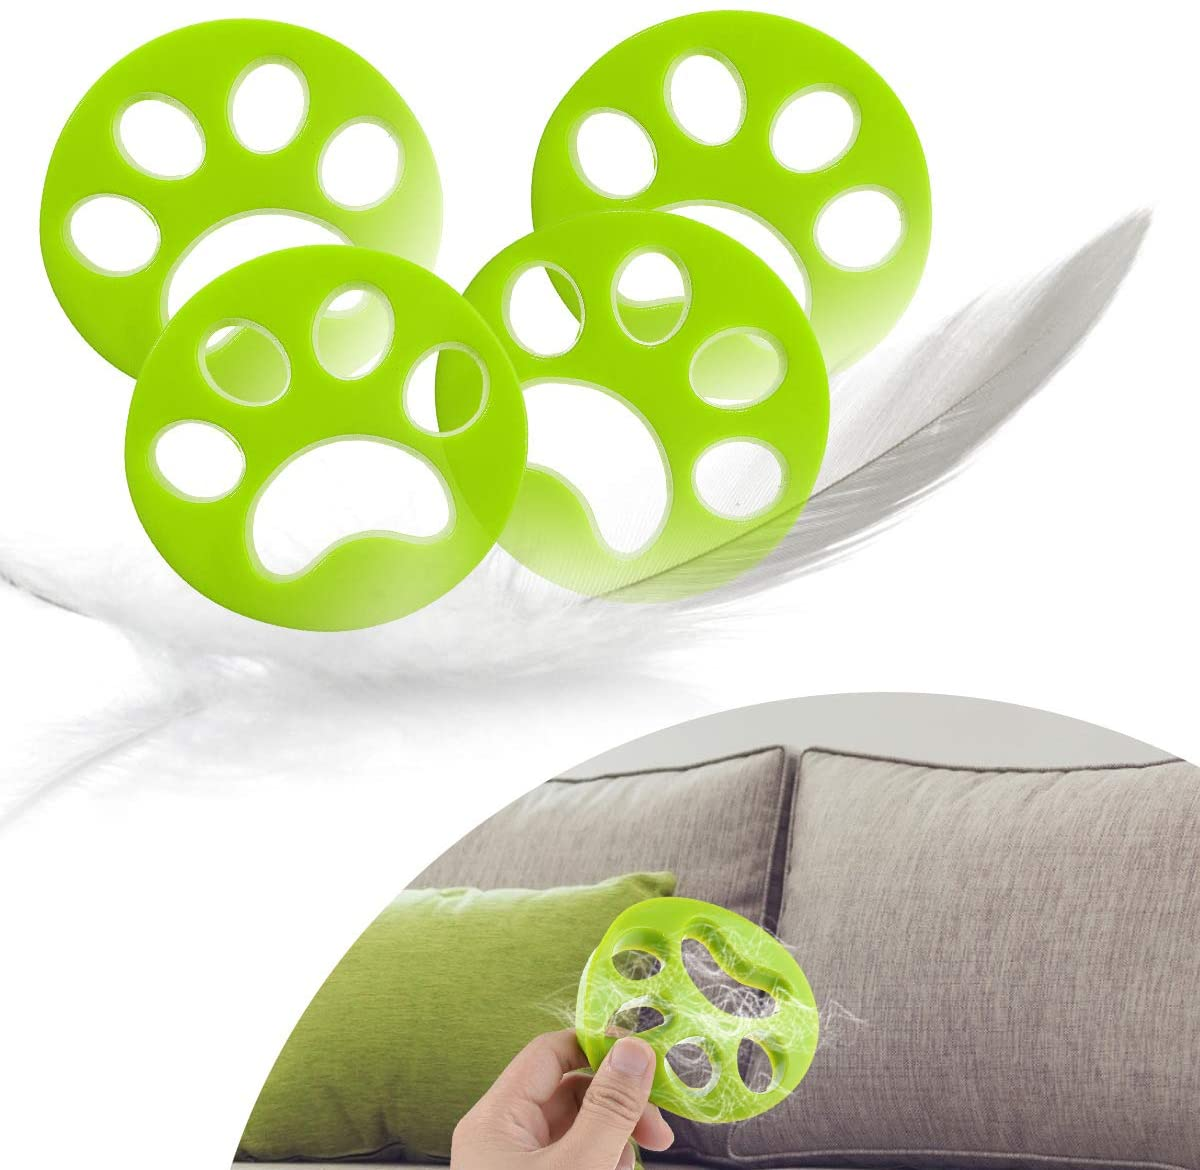 4 accesorios quita pelos para mascotas